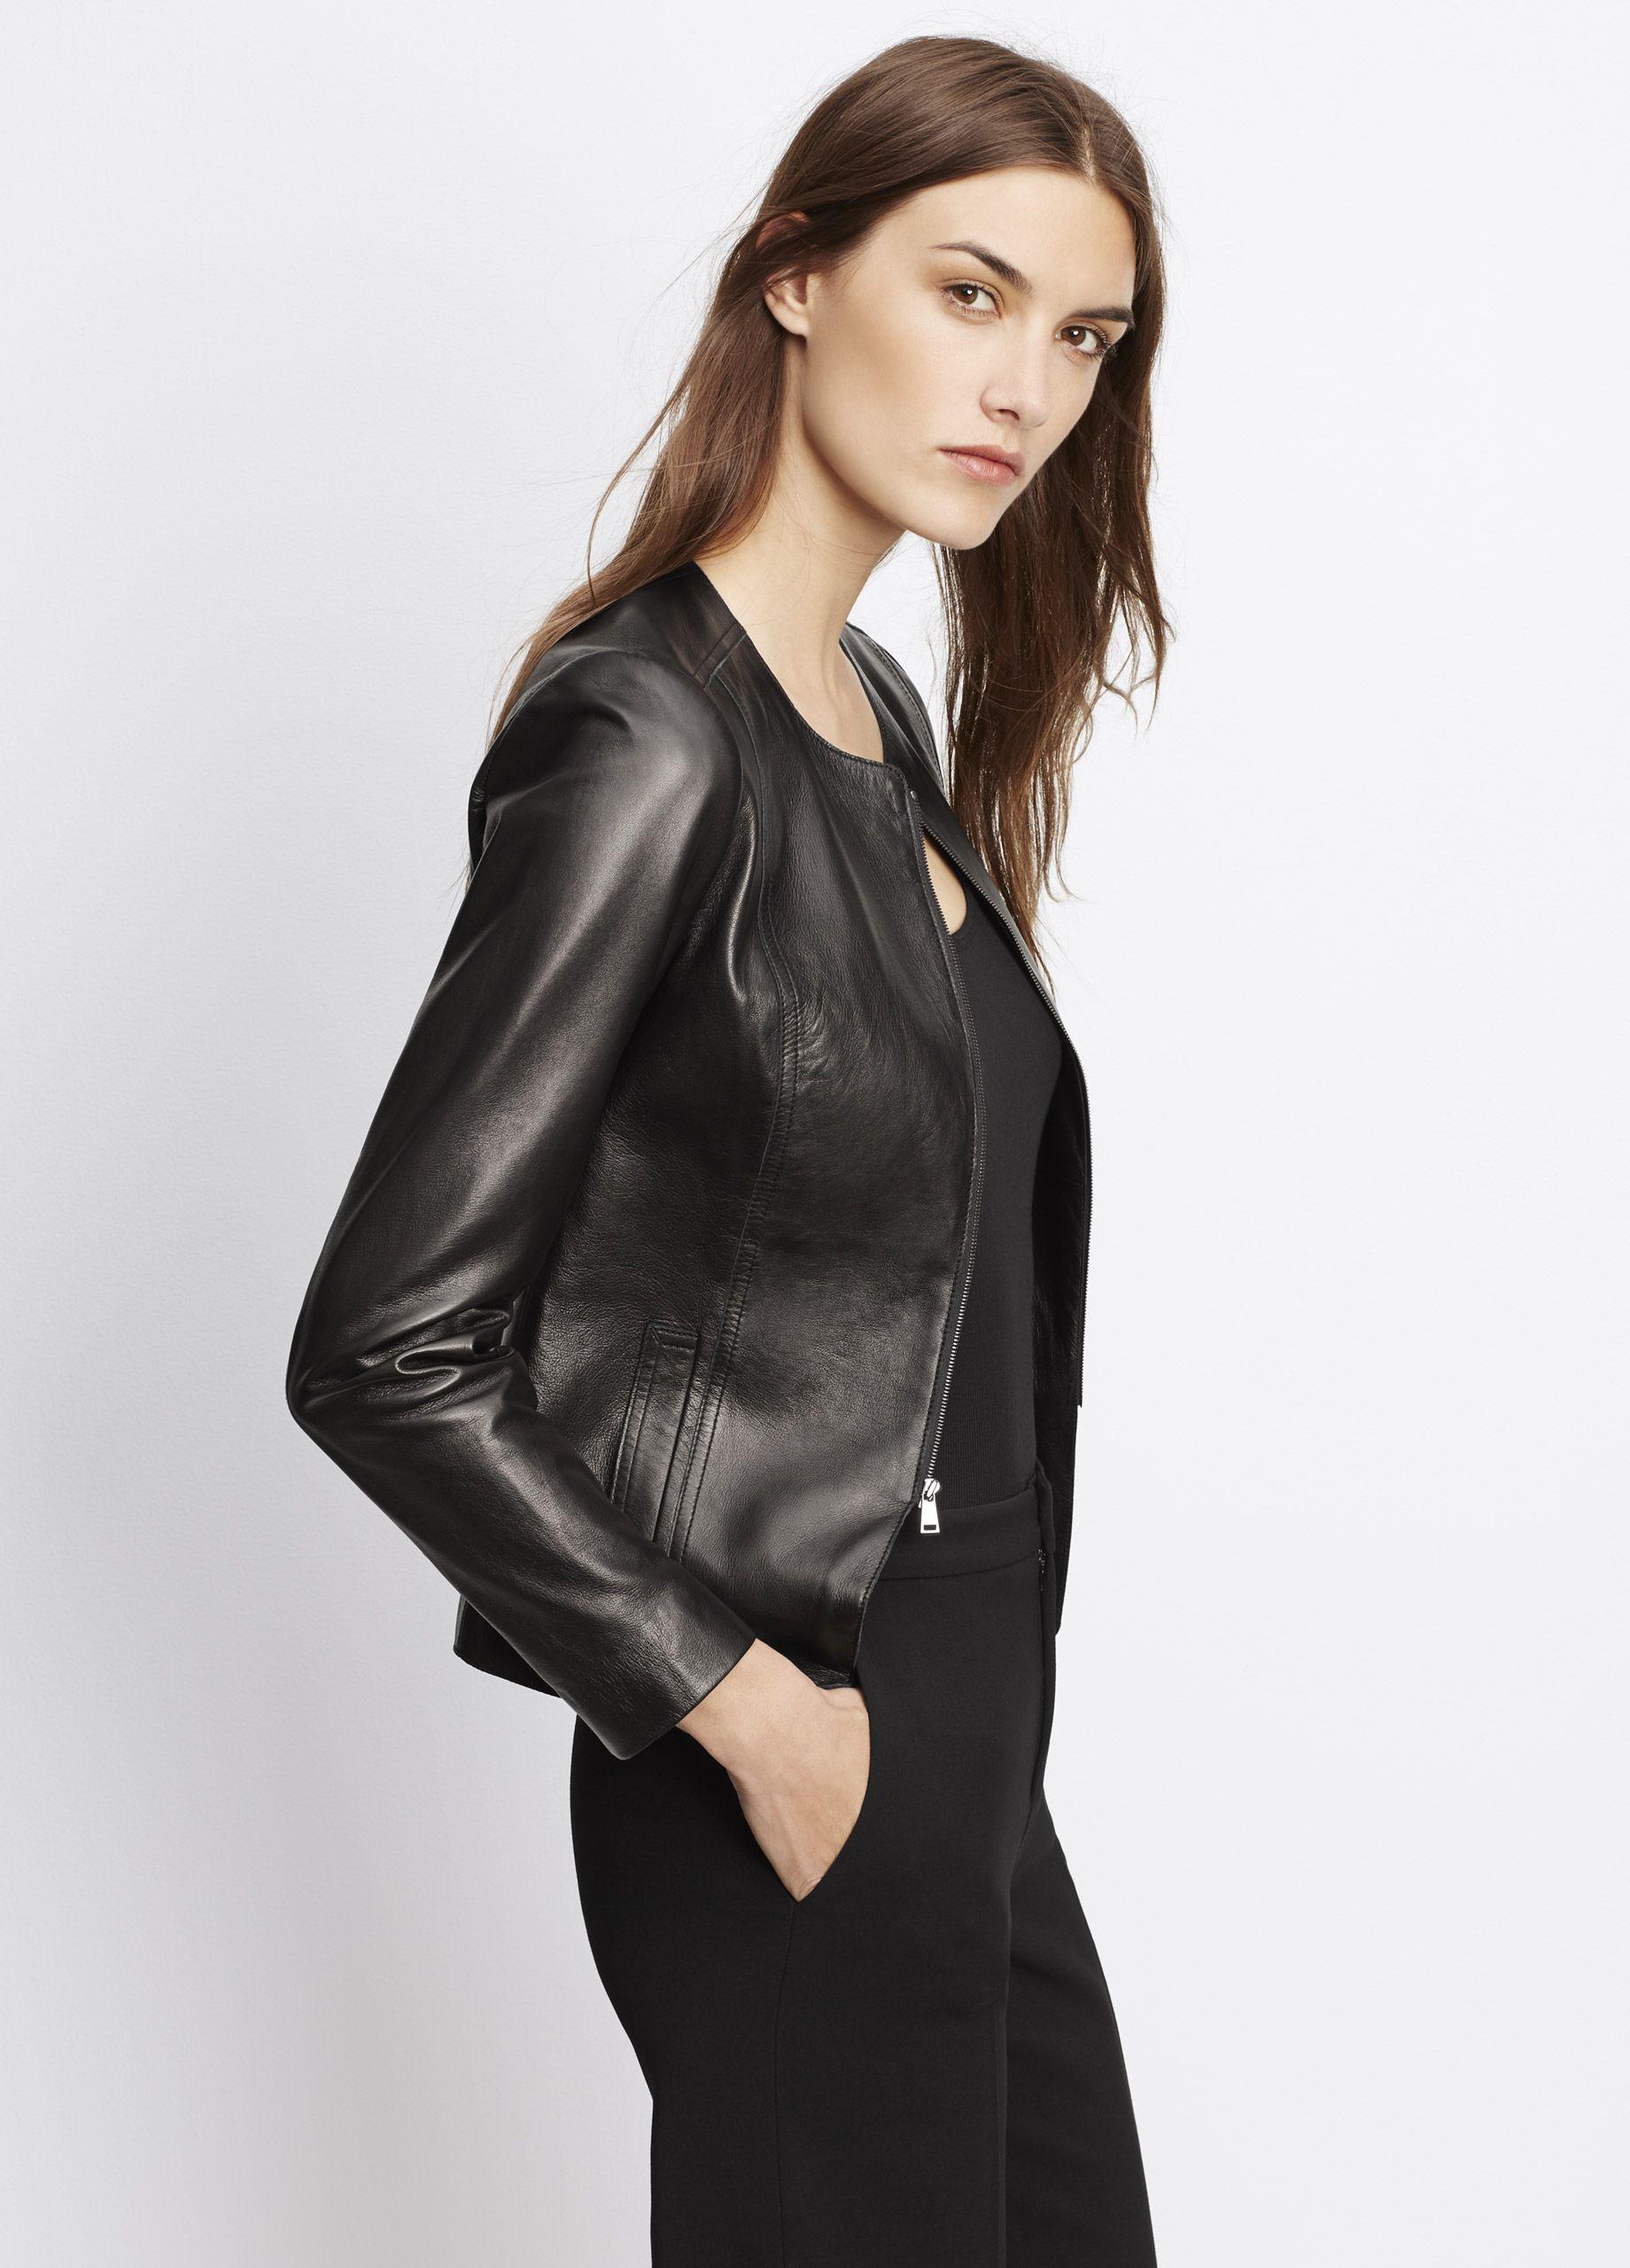 Tailored Collarless Leather Jacket Collarless Leather Jacket Leather Jacket Collarless Jacket [ 2560 x 1840 Pixel ]